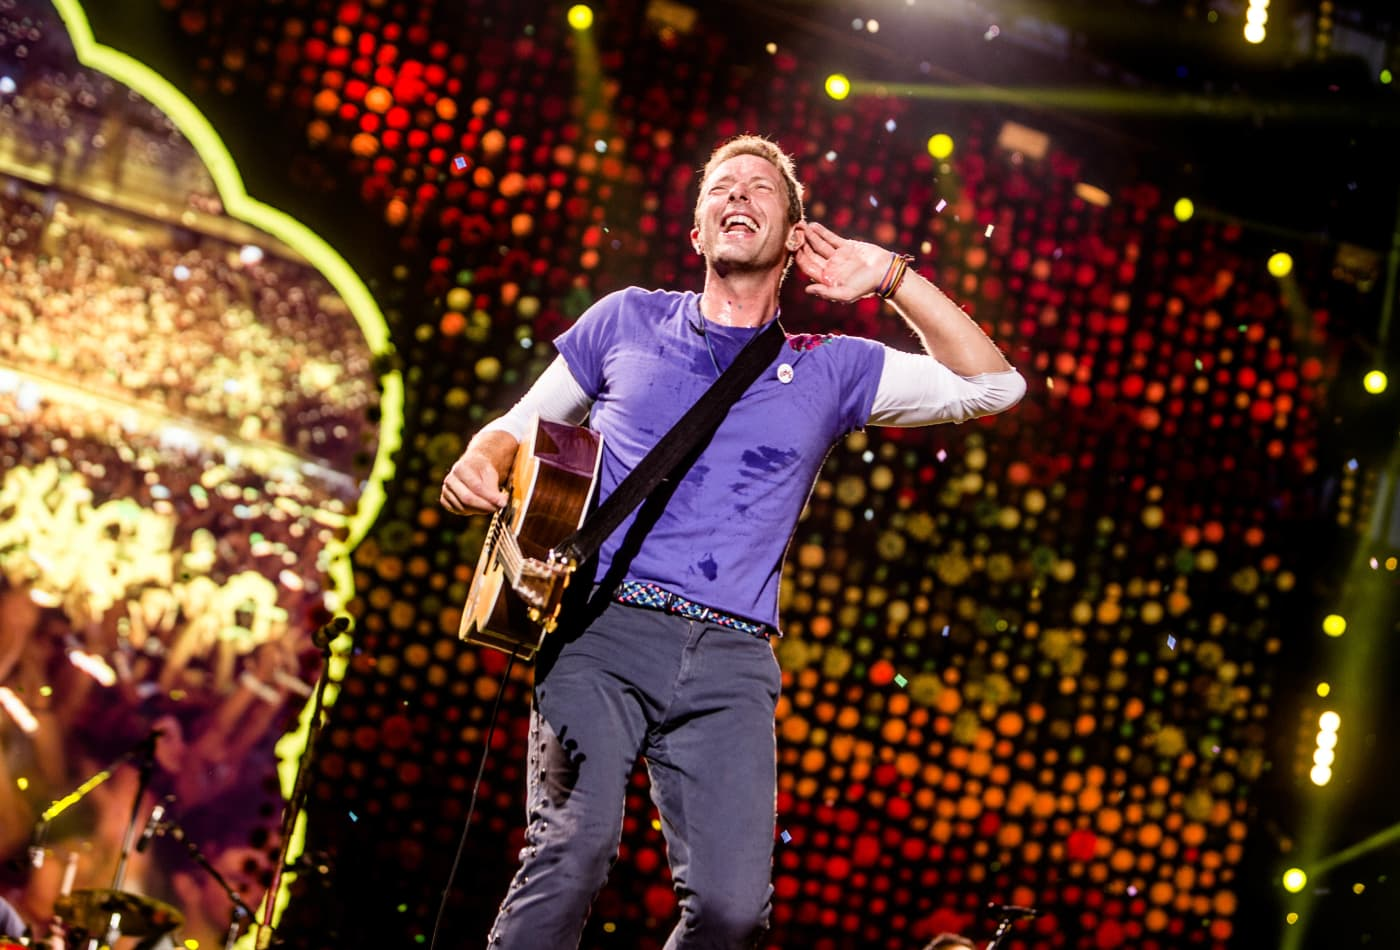 Chris Martin, John Legend, Bono and the future of the livestreamed concert beyond coronavirus